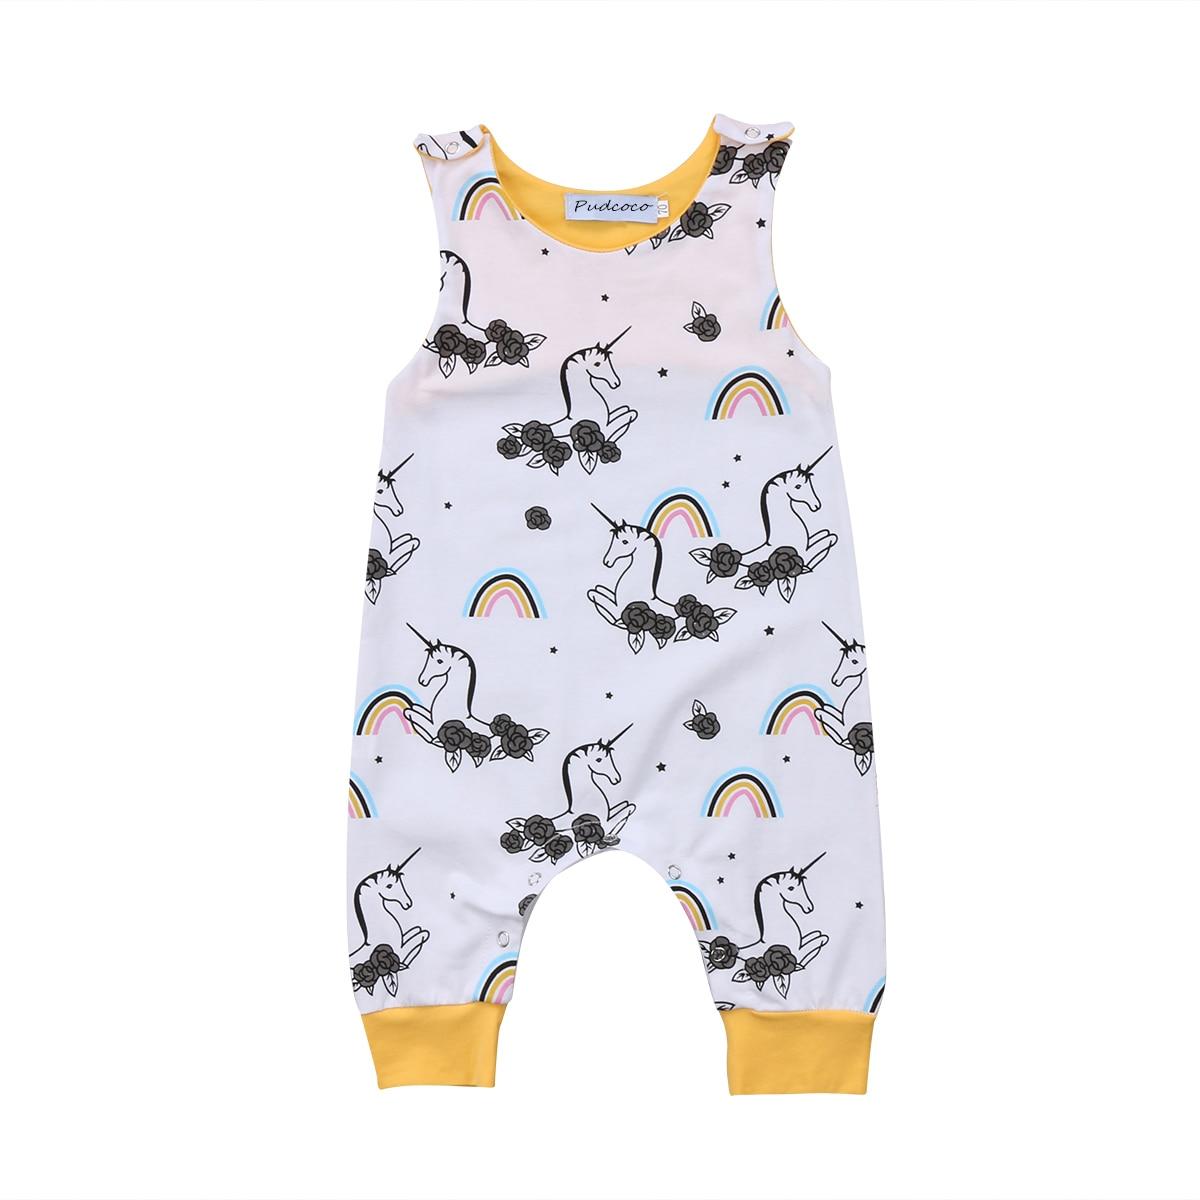 Pudcoco Infant Baby Boys Girls Unicorn Romper Cotton Outfits Floral Jumpsuit Clothes